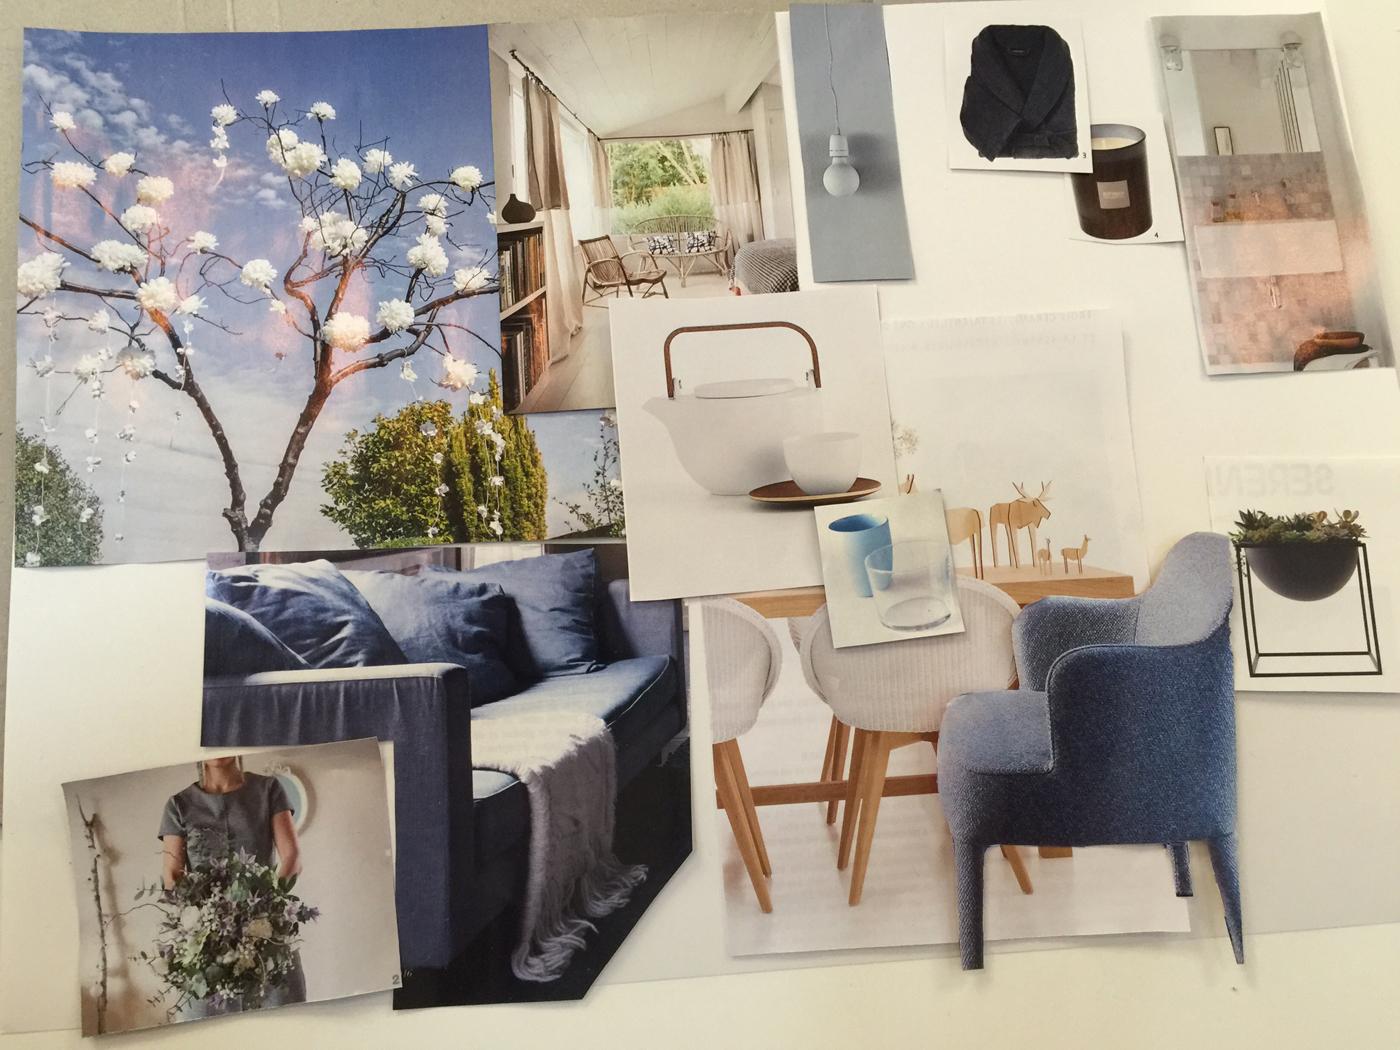 atelier planche d 39 inspiration chez my home design dkomag. Black Bedroom Furniture Sets. Home Design Ideas